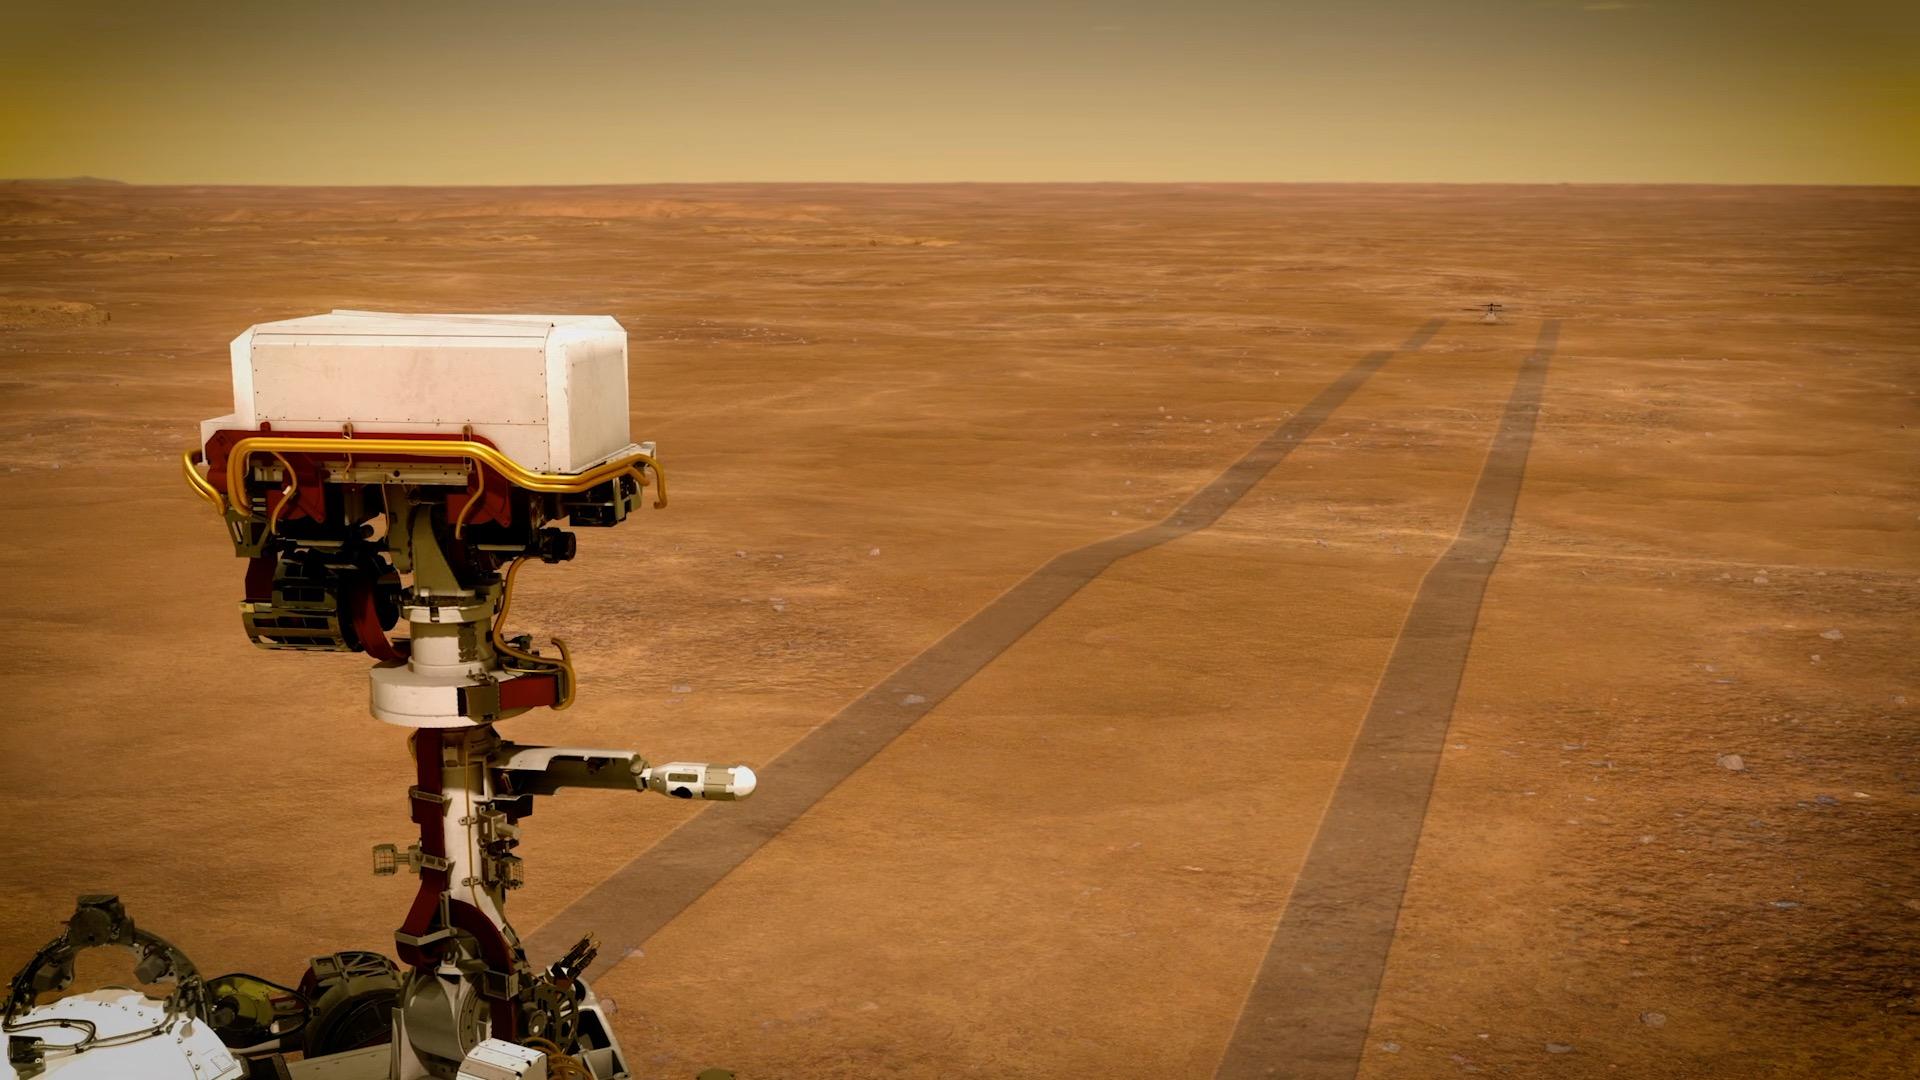 Perseverance cherche où poser l'hélicoptère Ingenuity sur Mars - Numerama